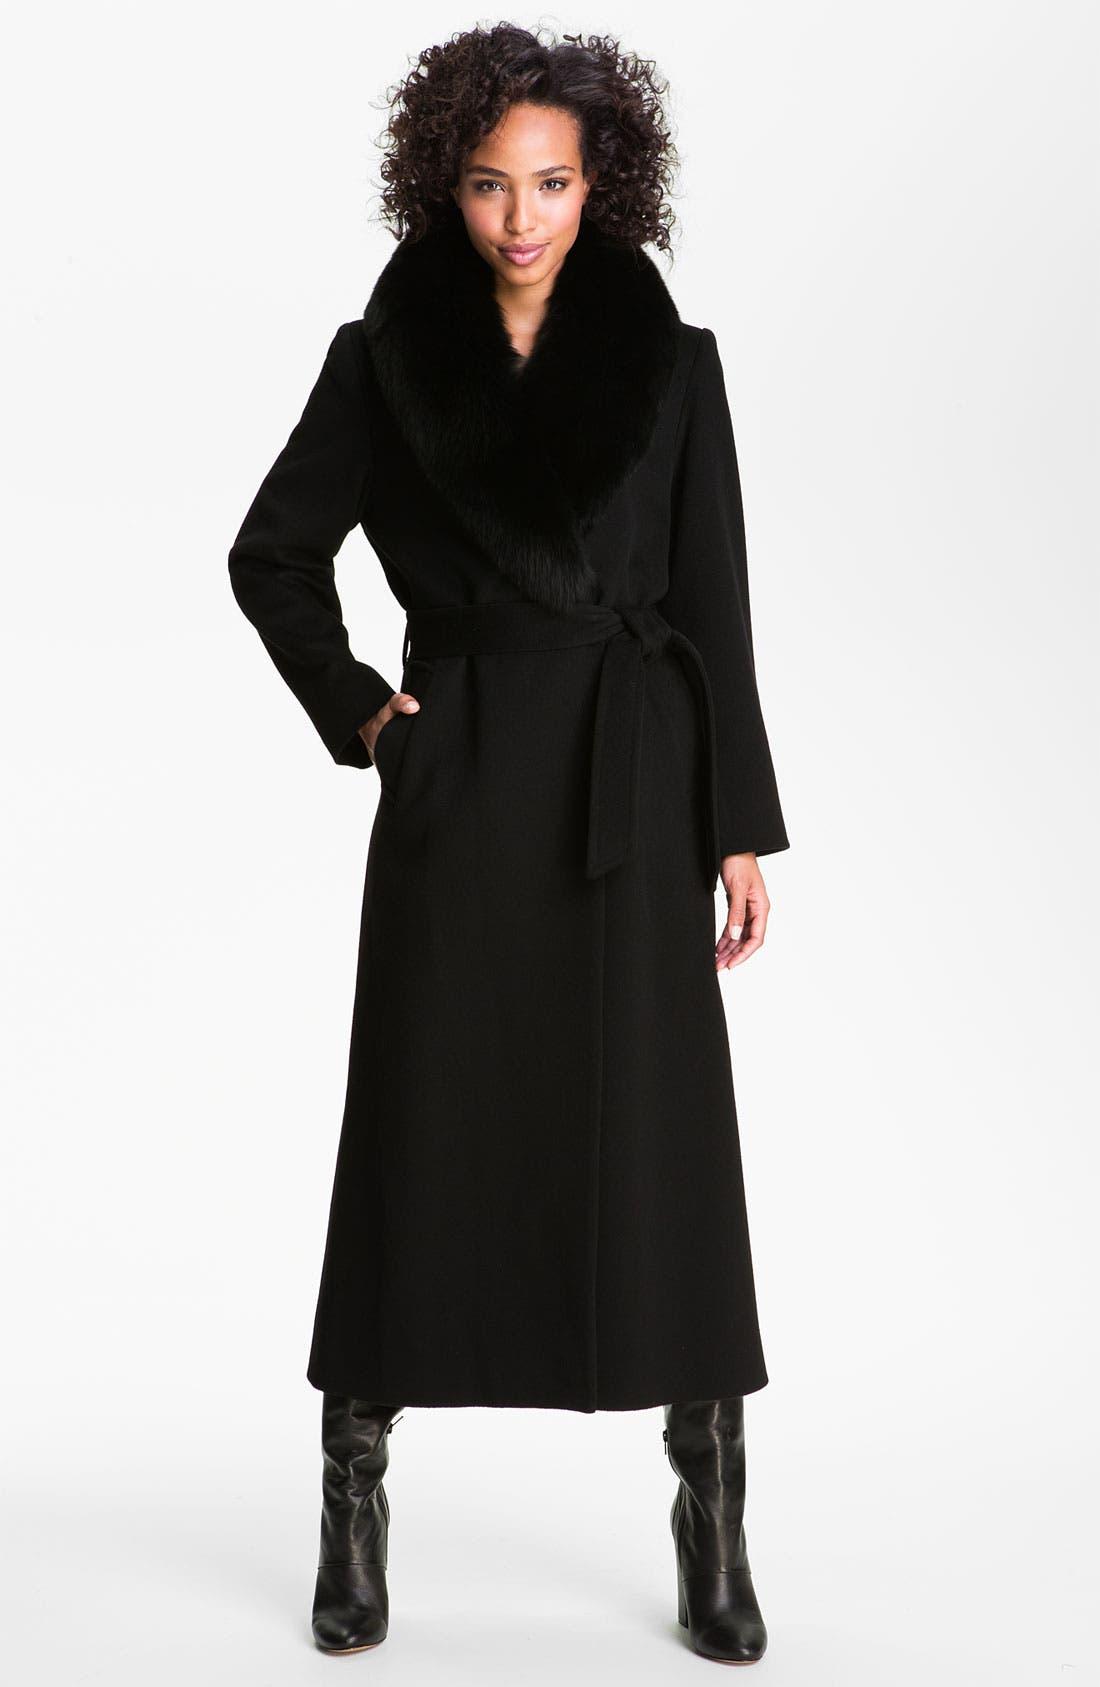 Main Image - Dale Dressin Long Wrap Coat with Fox Fur Collar